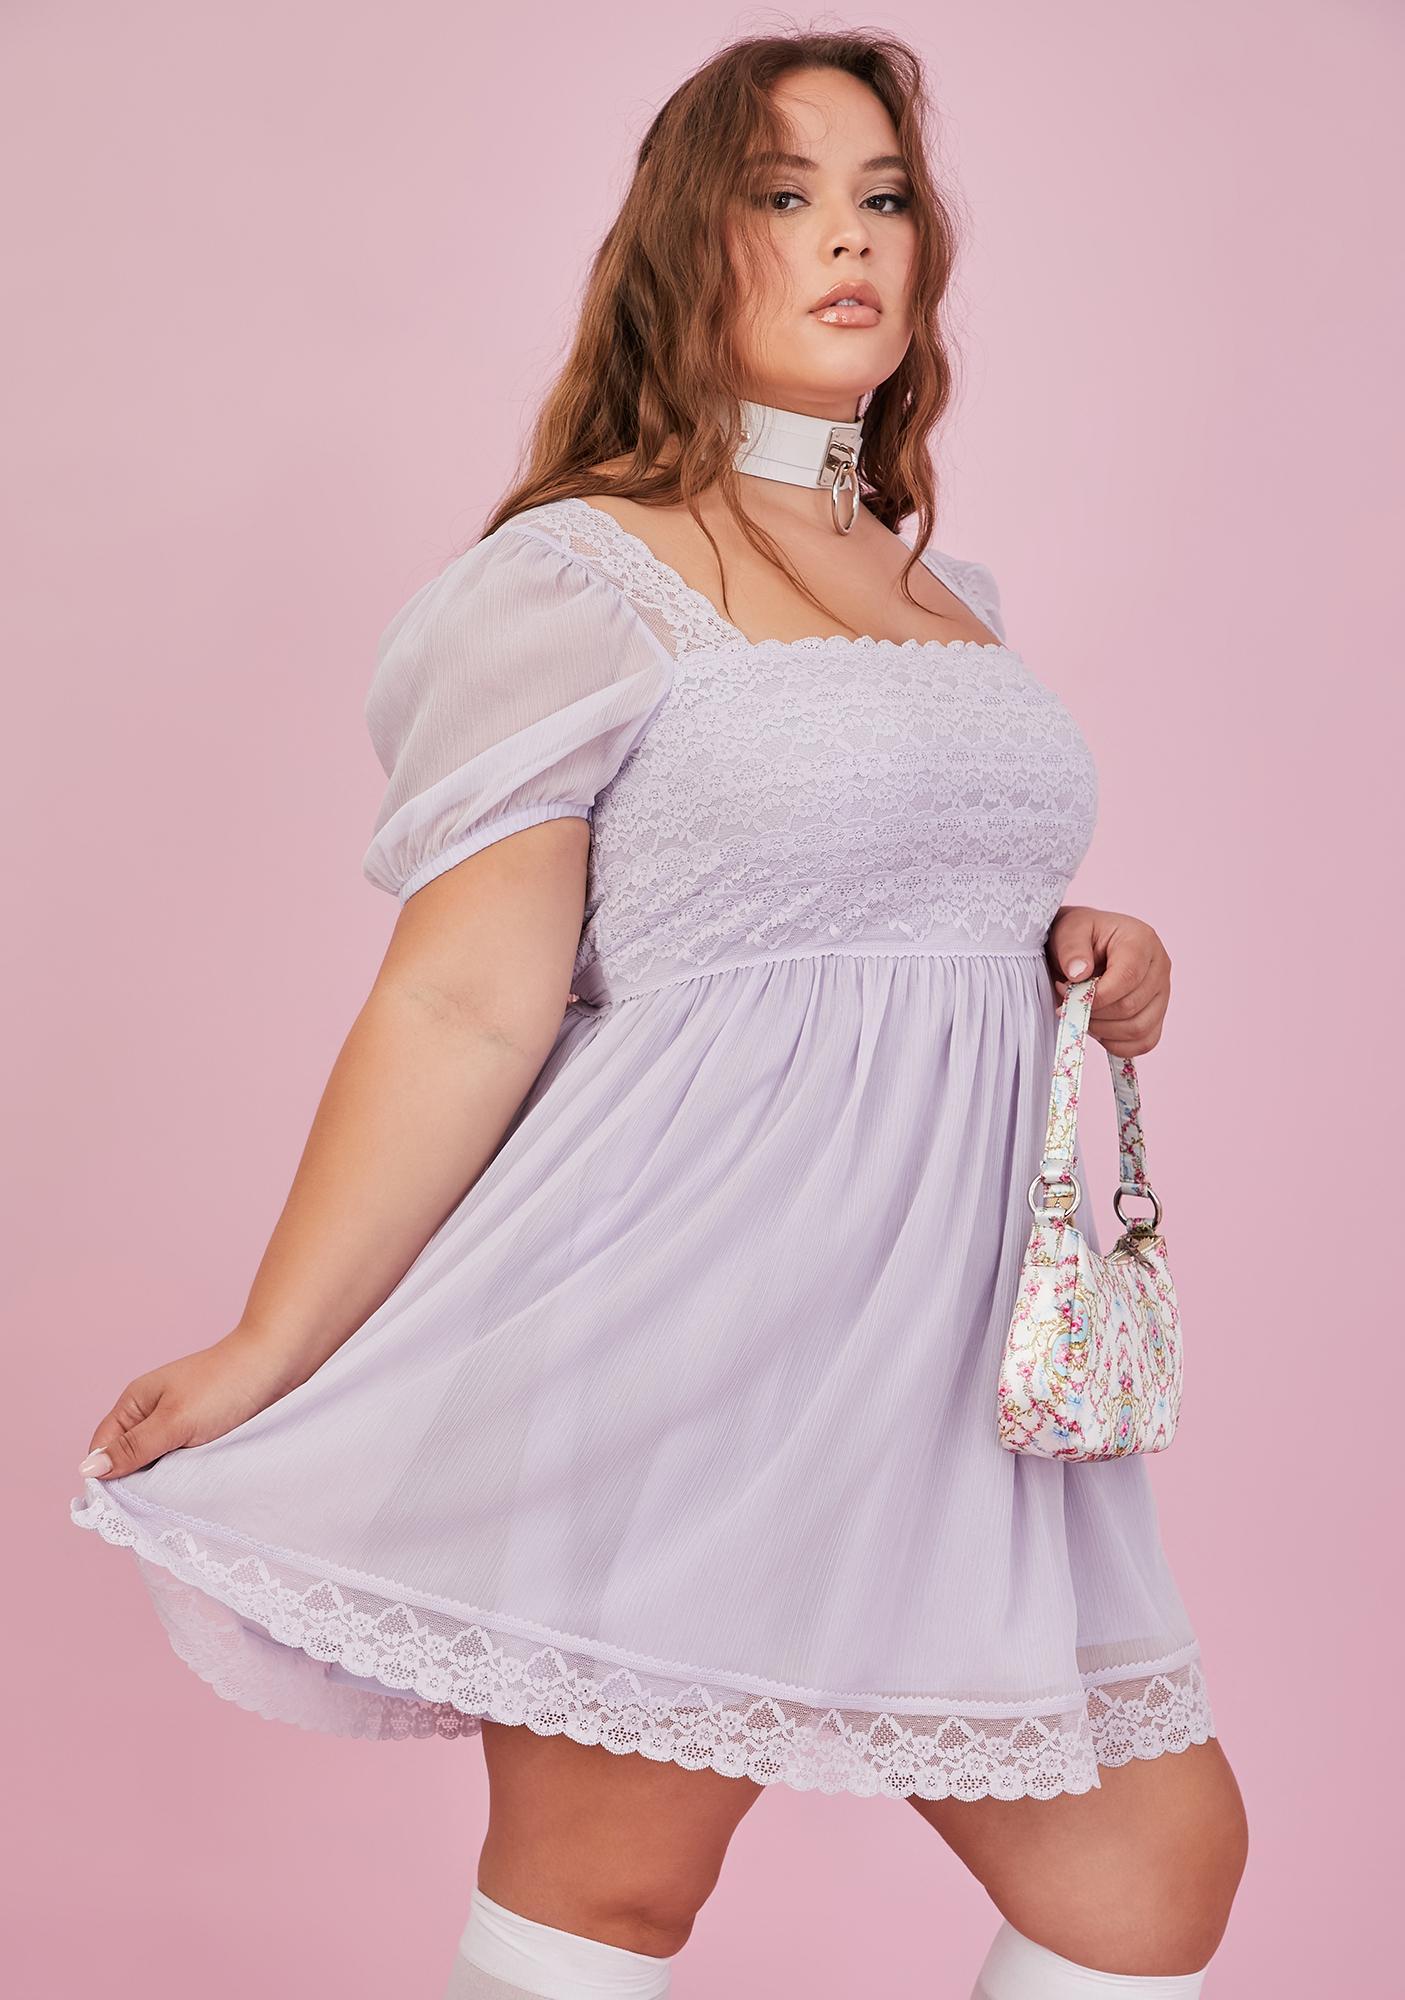 Sugar Thrillz Fairy Juicy Honeydew Pucker Babydoll Dress